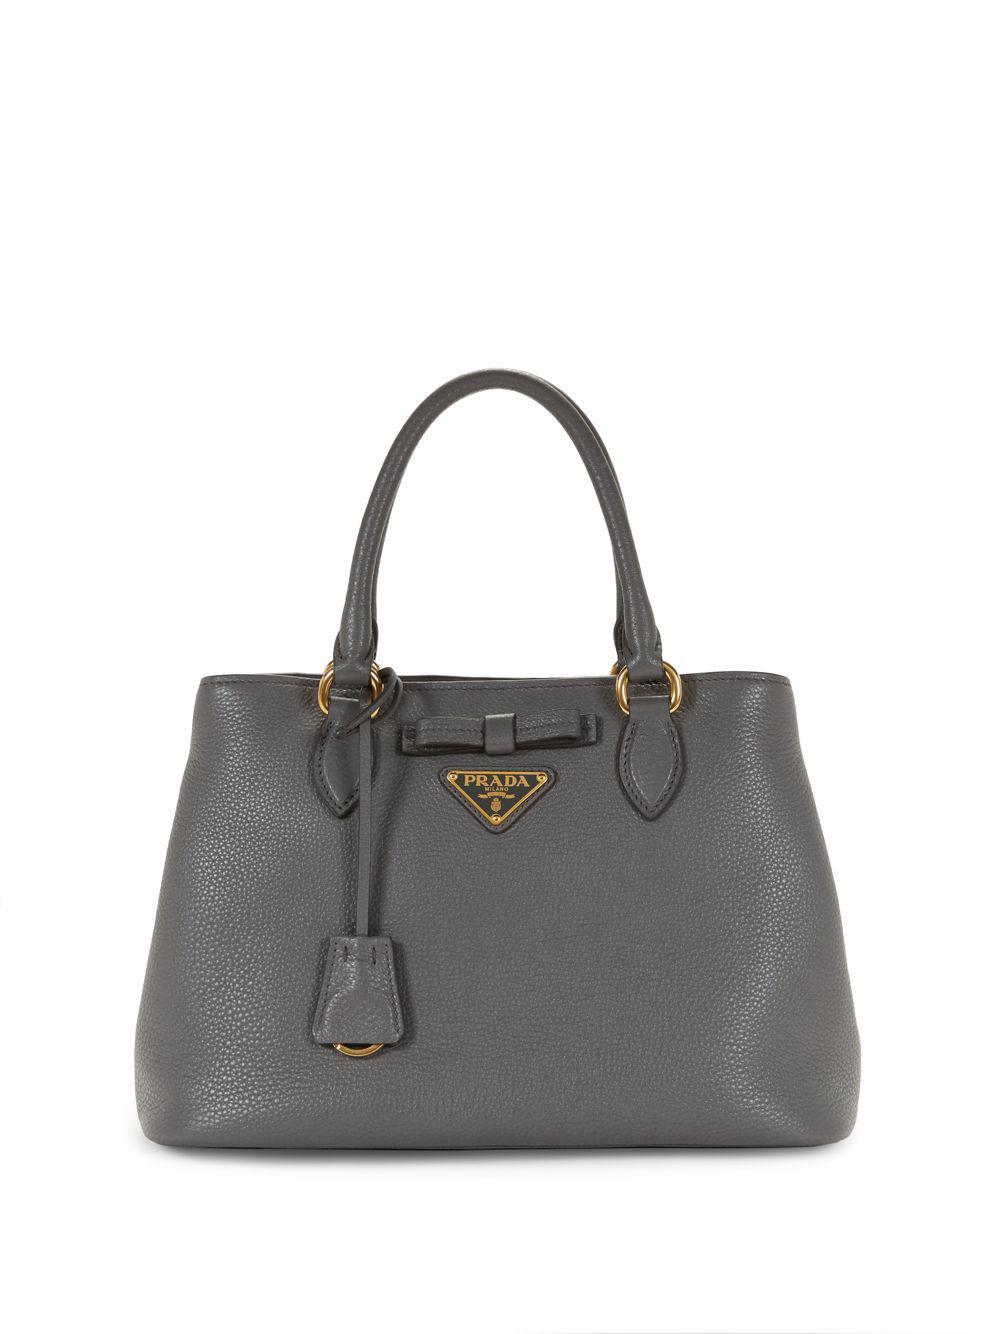 Prada - Gray Leather Logo Satchel - Lyst. View fullscreen 8d594855ec6ce